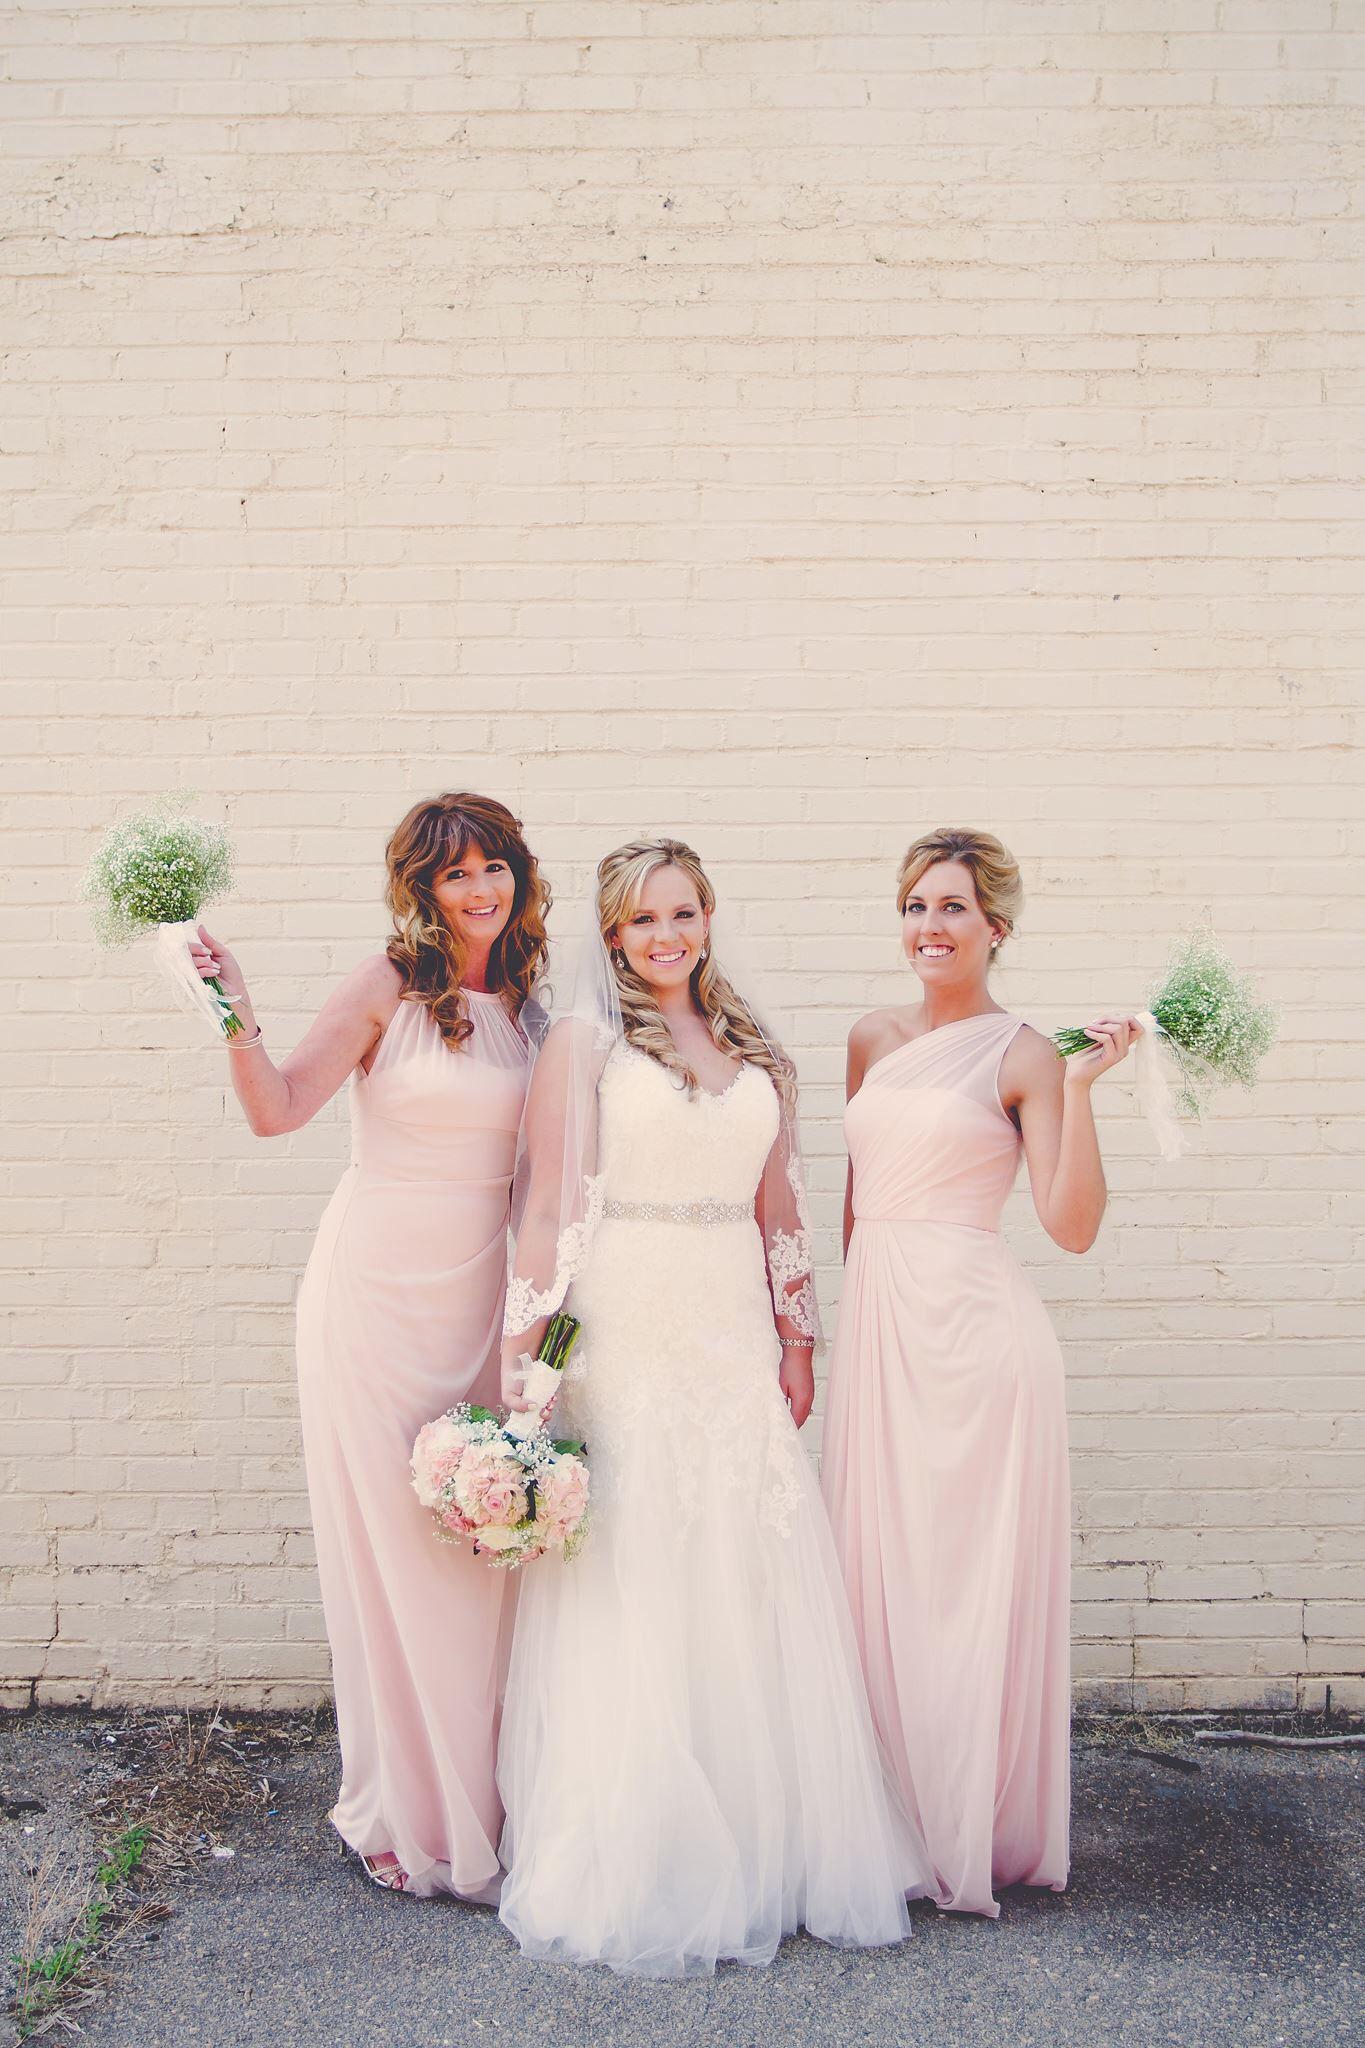 Pink bridesmaid dresses Summer wedding  Babies breath  Amanda Morgan photography